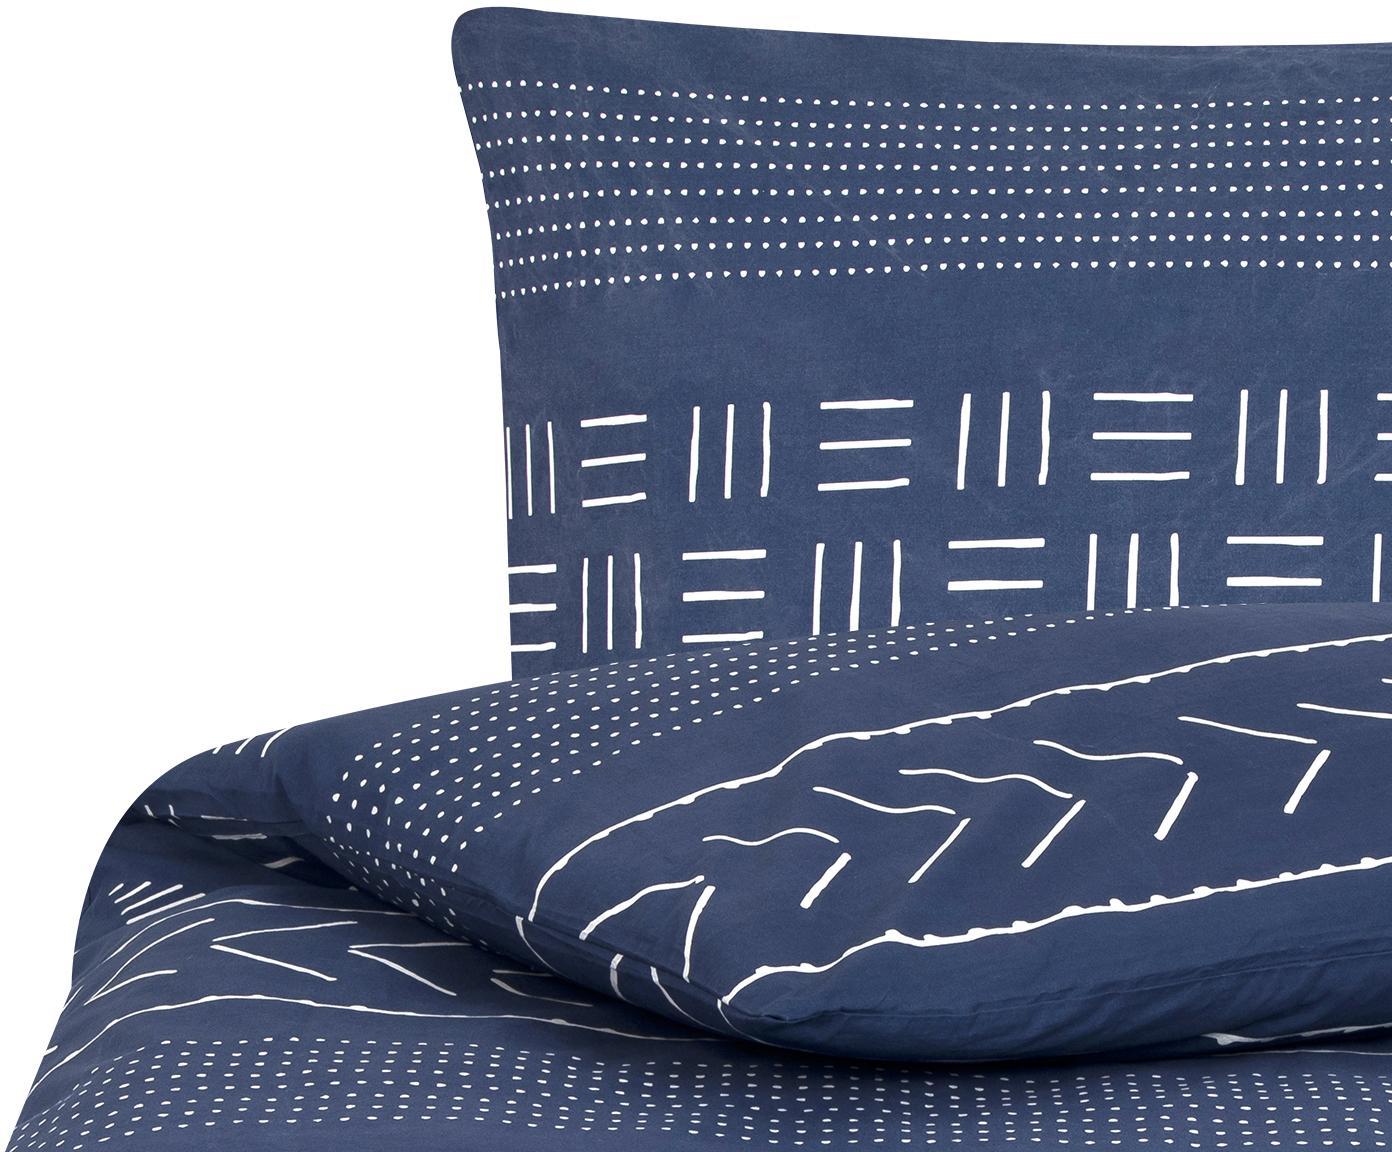 Gewaschene Baumwoll-Bettwäsche Kohana im Boho Style, Webart: Perkal Fadendichte 180 TC, Dunkelblau, Ecru, 135 x 200 cm + 1 Kissen 80 x 80 cm